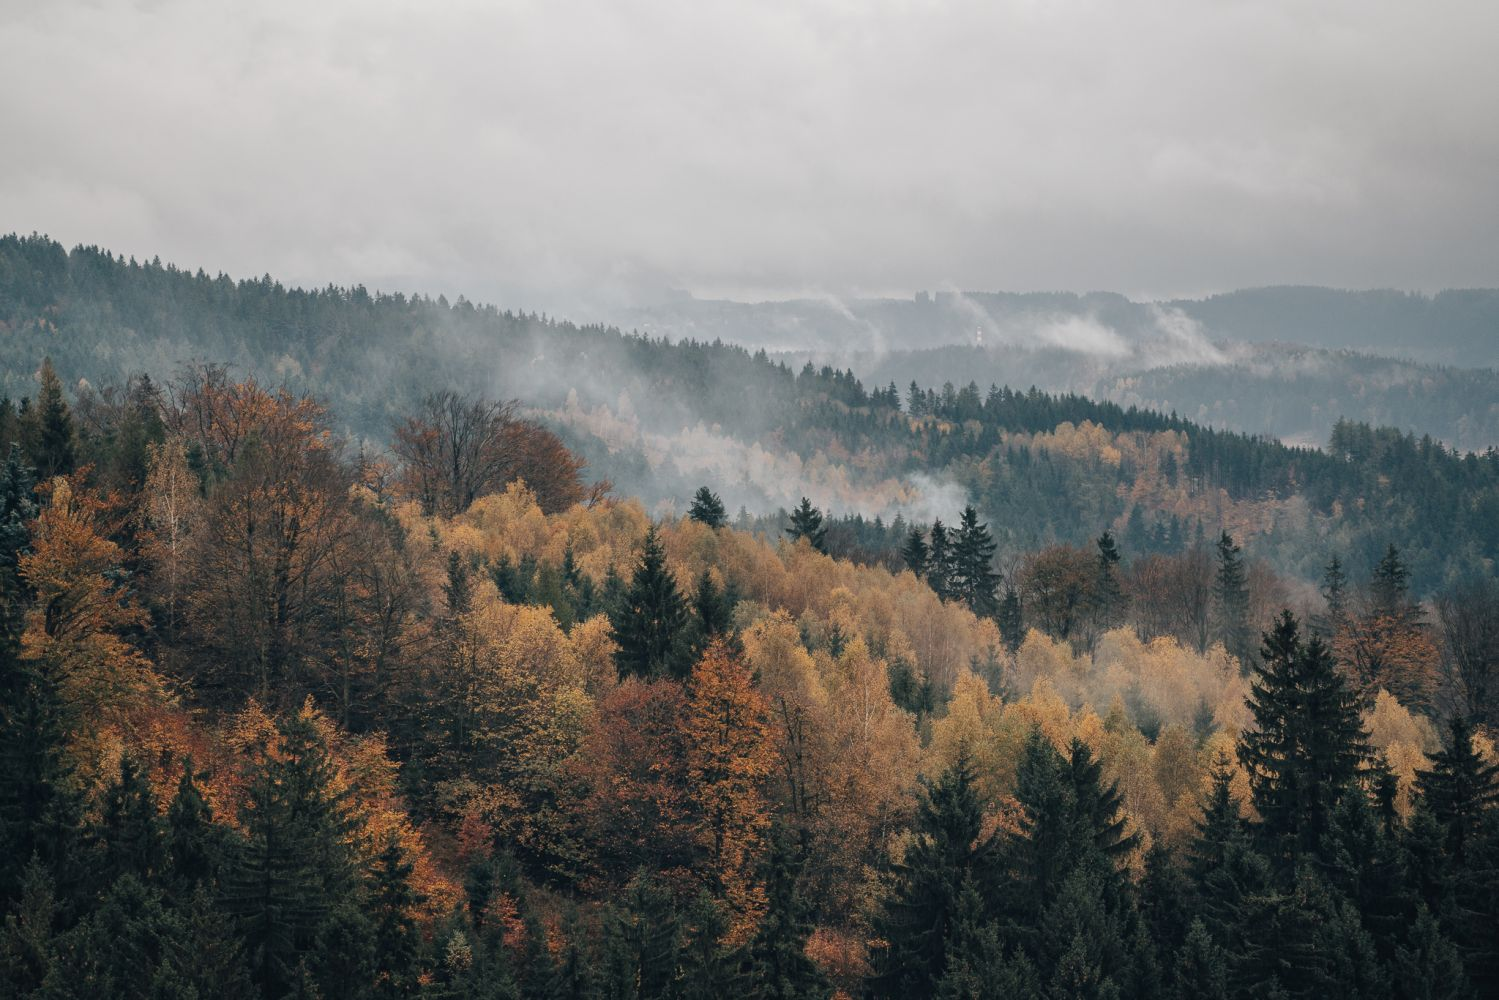 Obrázek v galerii pro Liberec